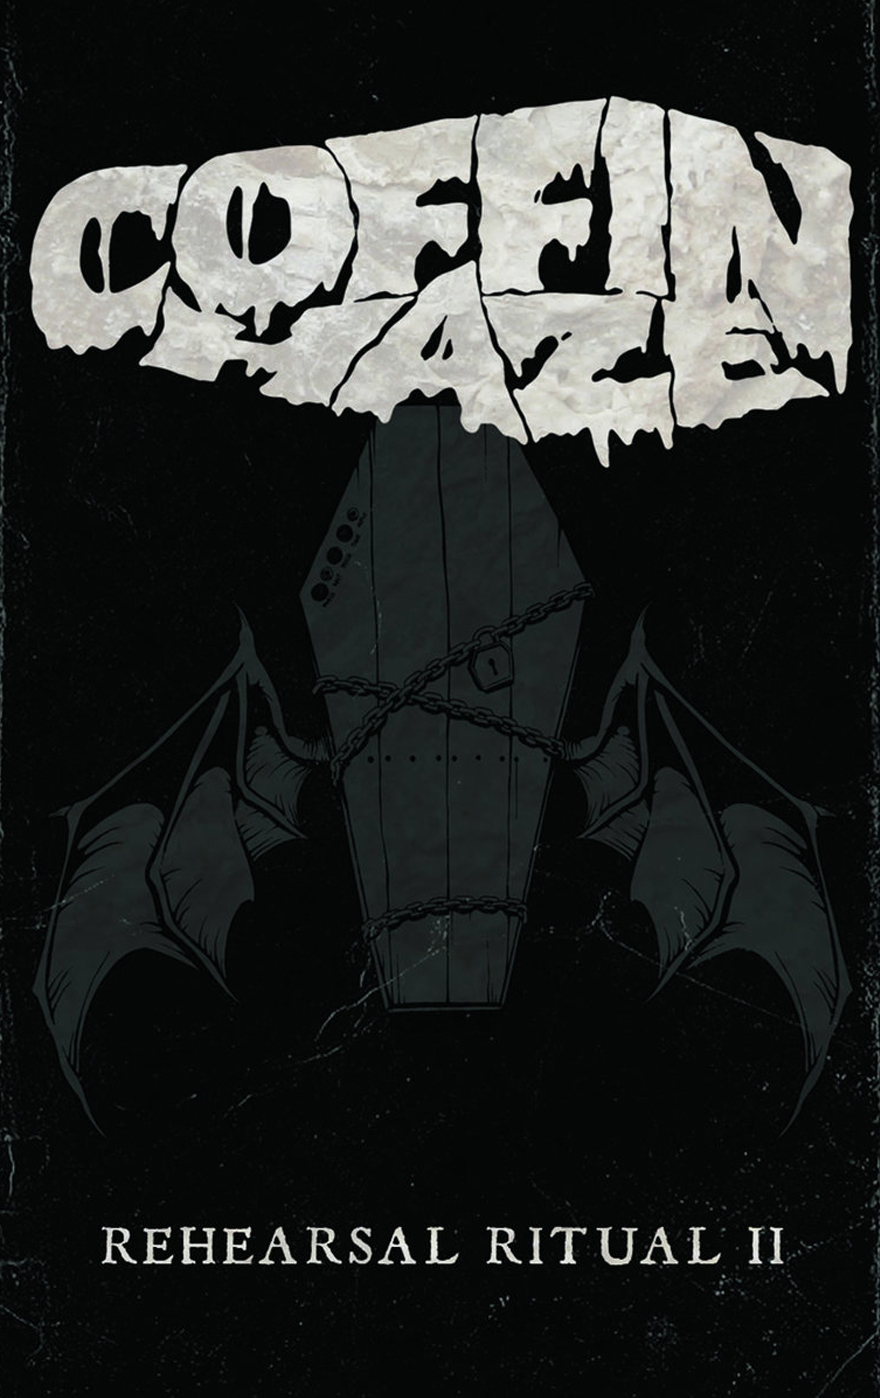 Coffin Haze - Rehearsal Rituals II [CS]